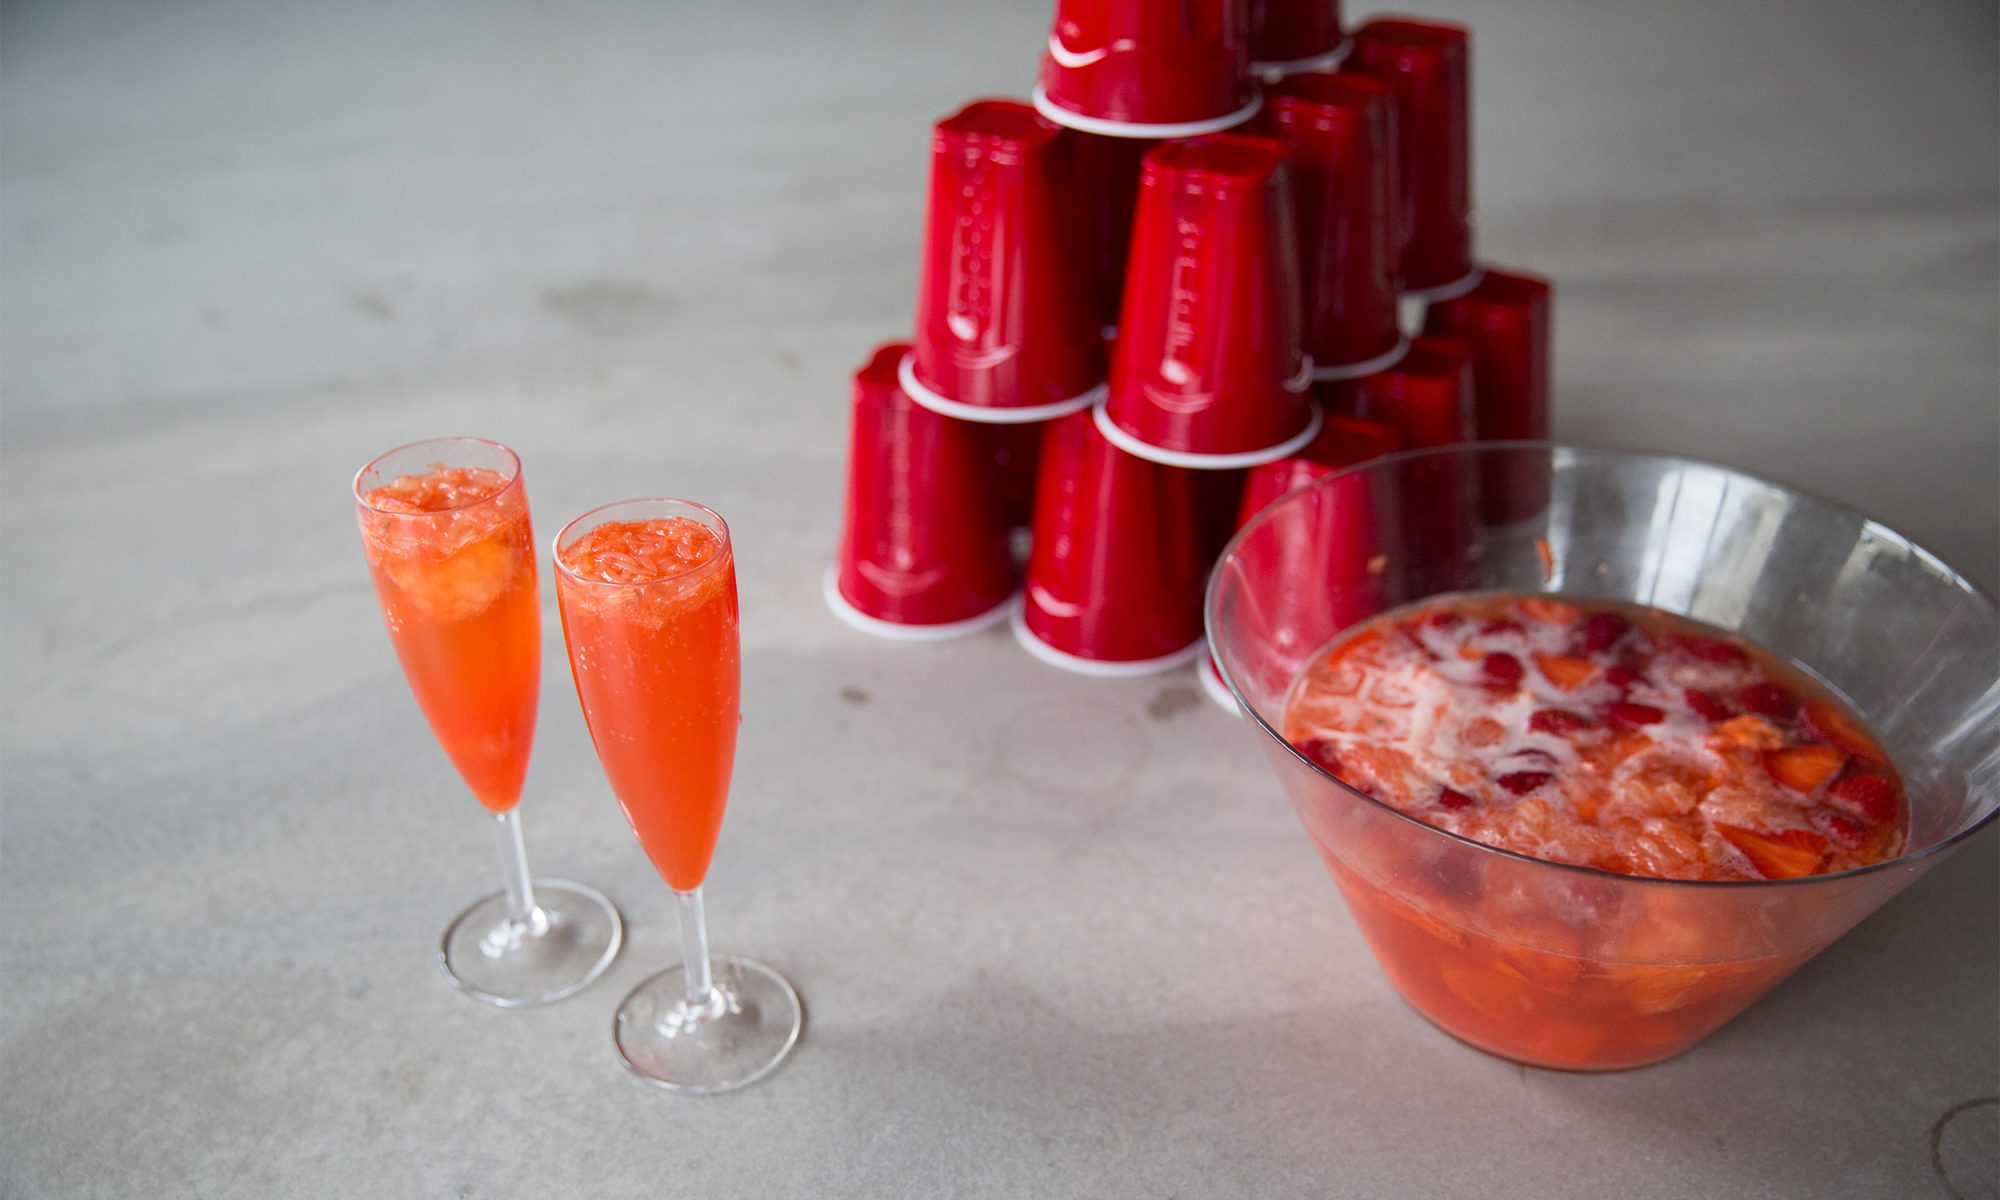 EC: Jungle Juice Mimosas Are Frat House Fancy